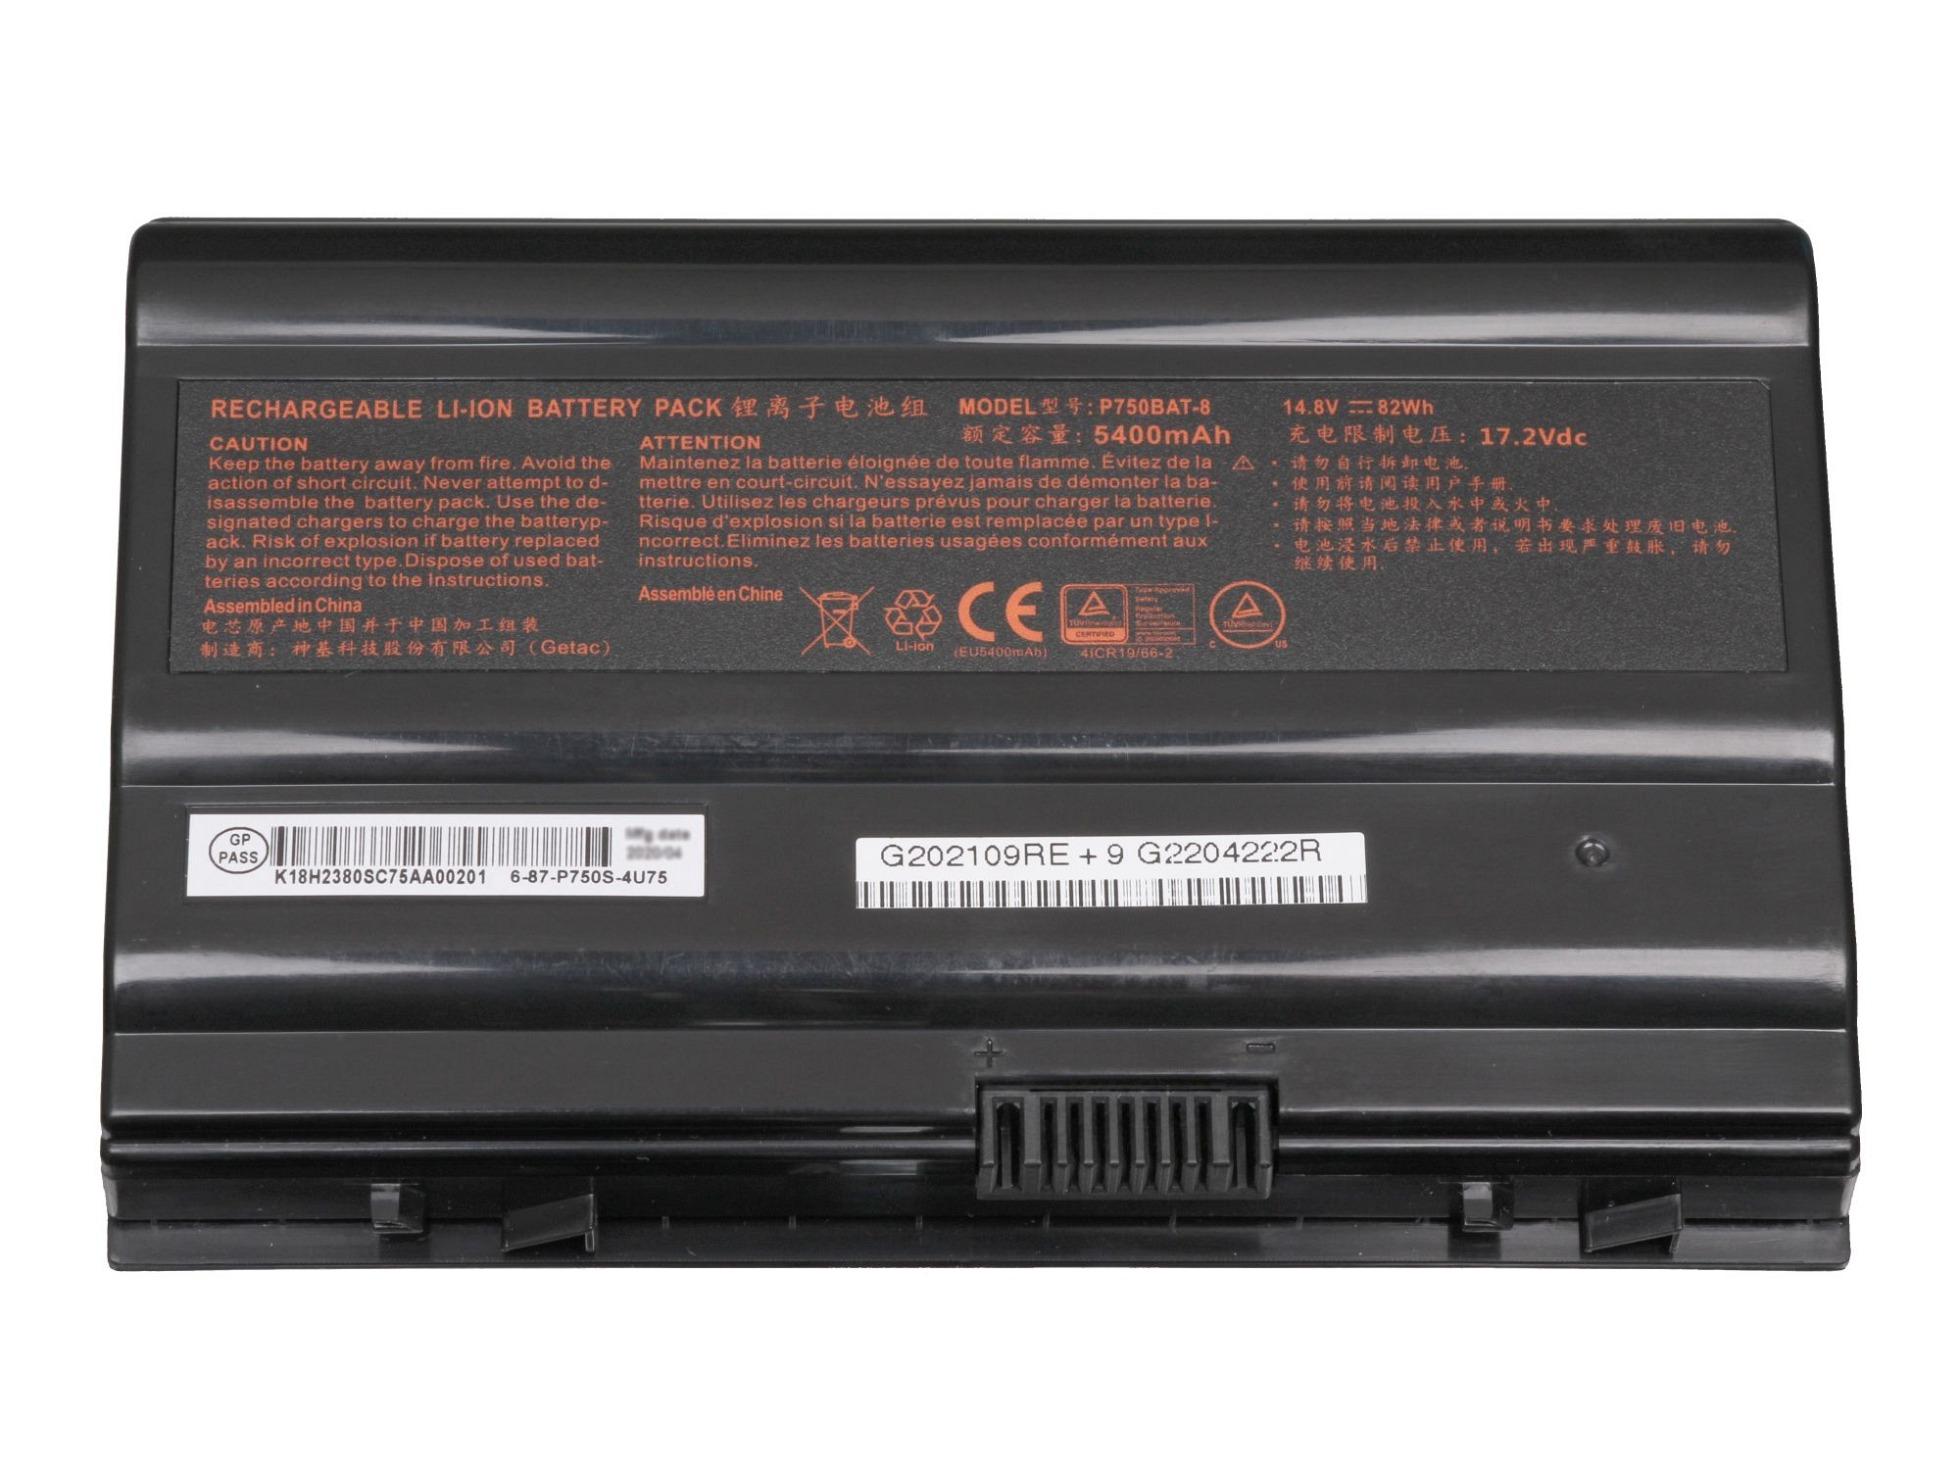 Akku Mifcom XG7-S (P771DM) (ID: 2406)